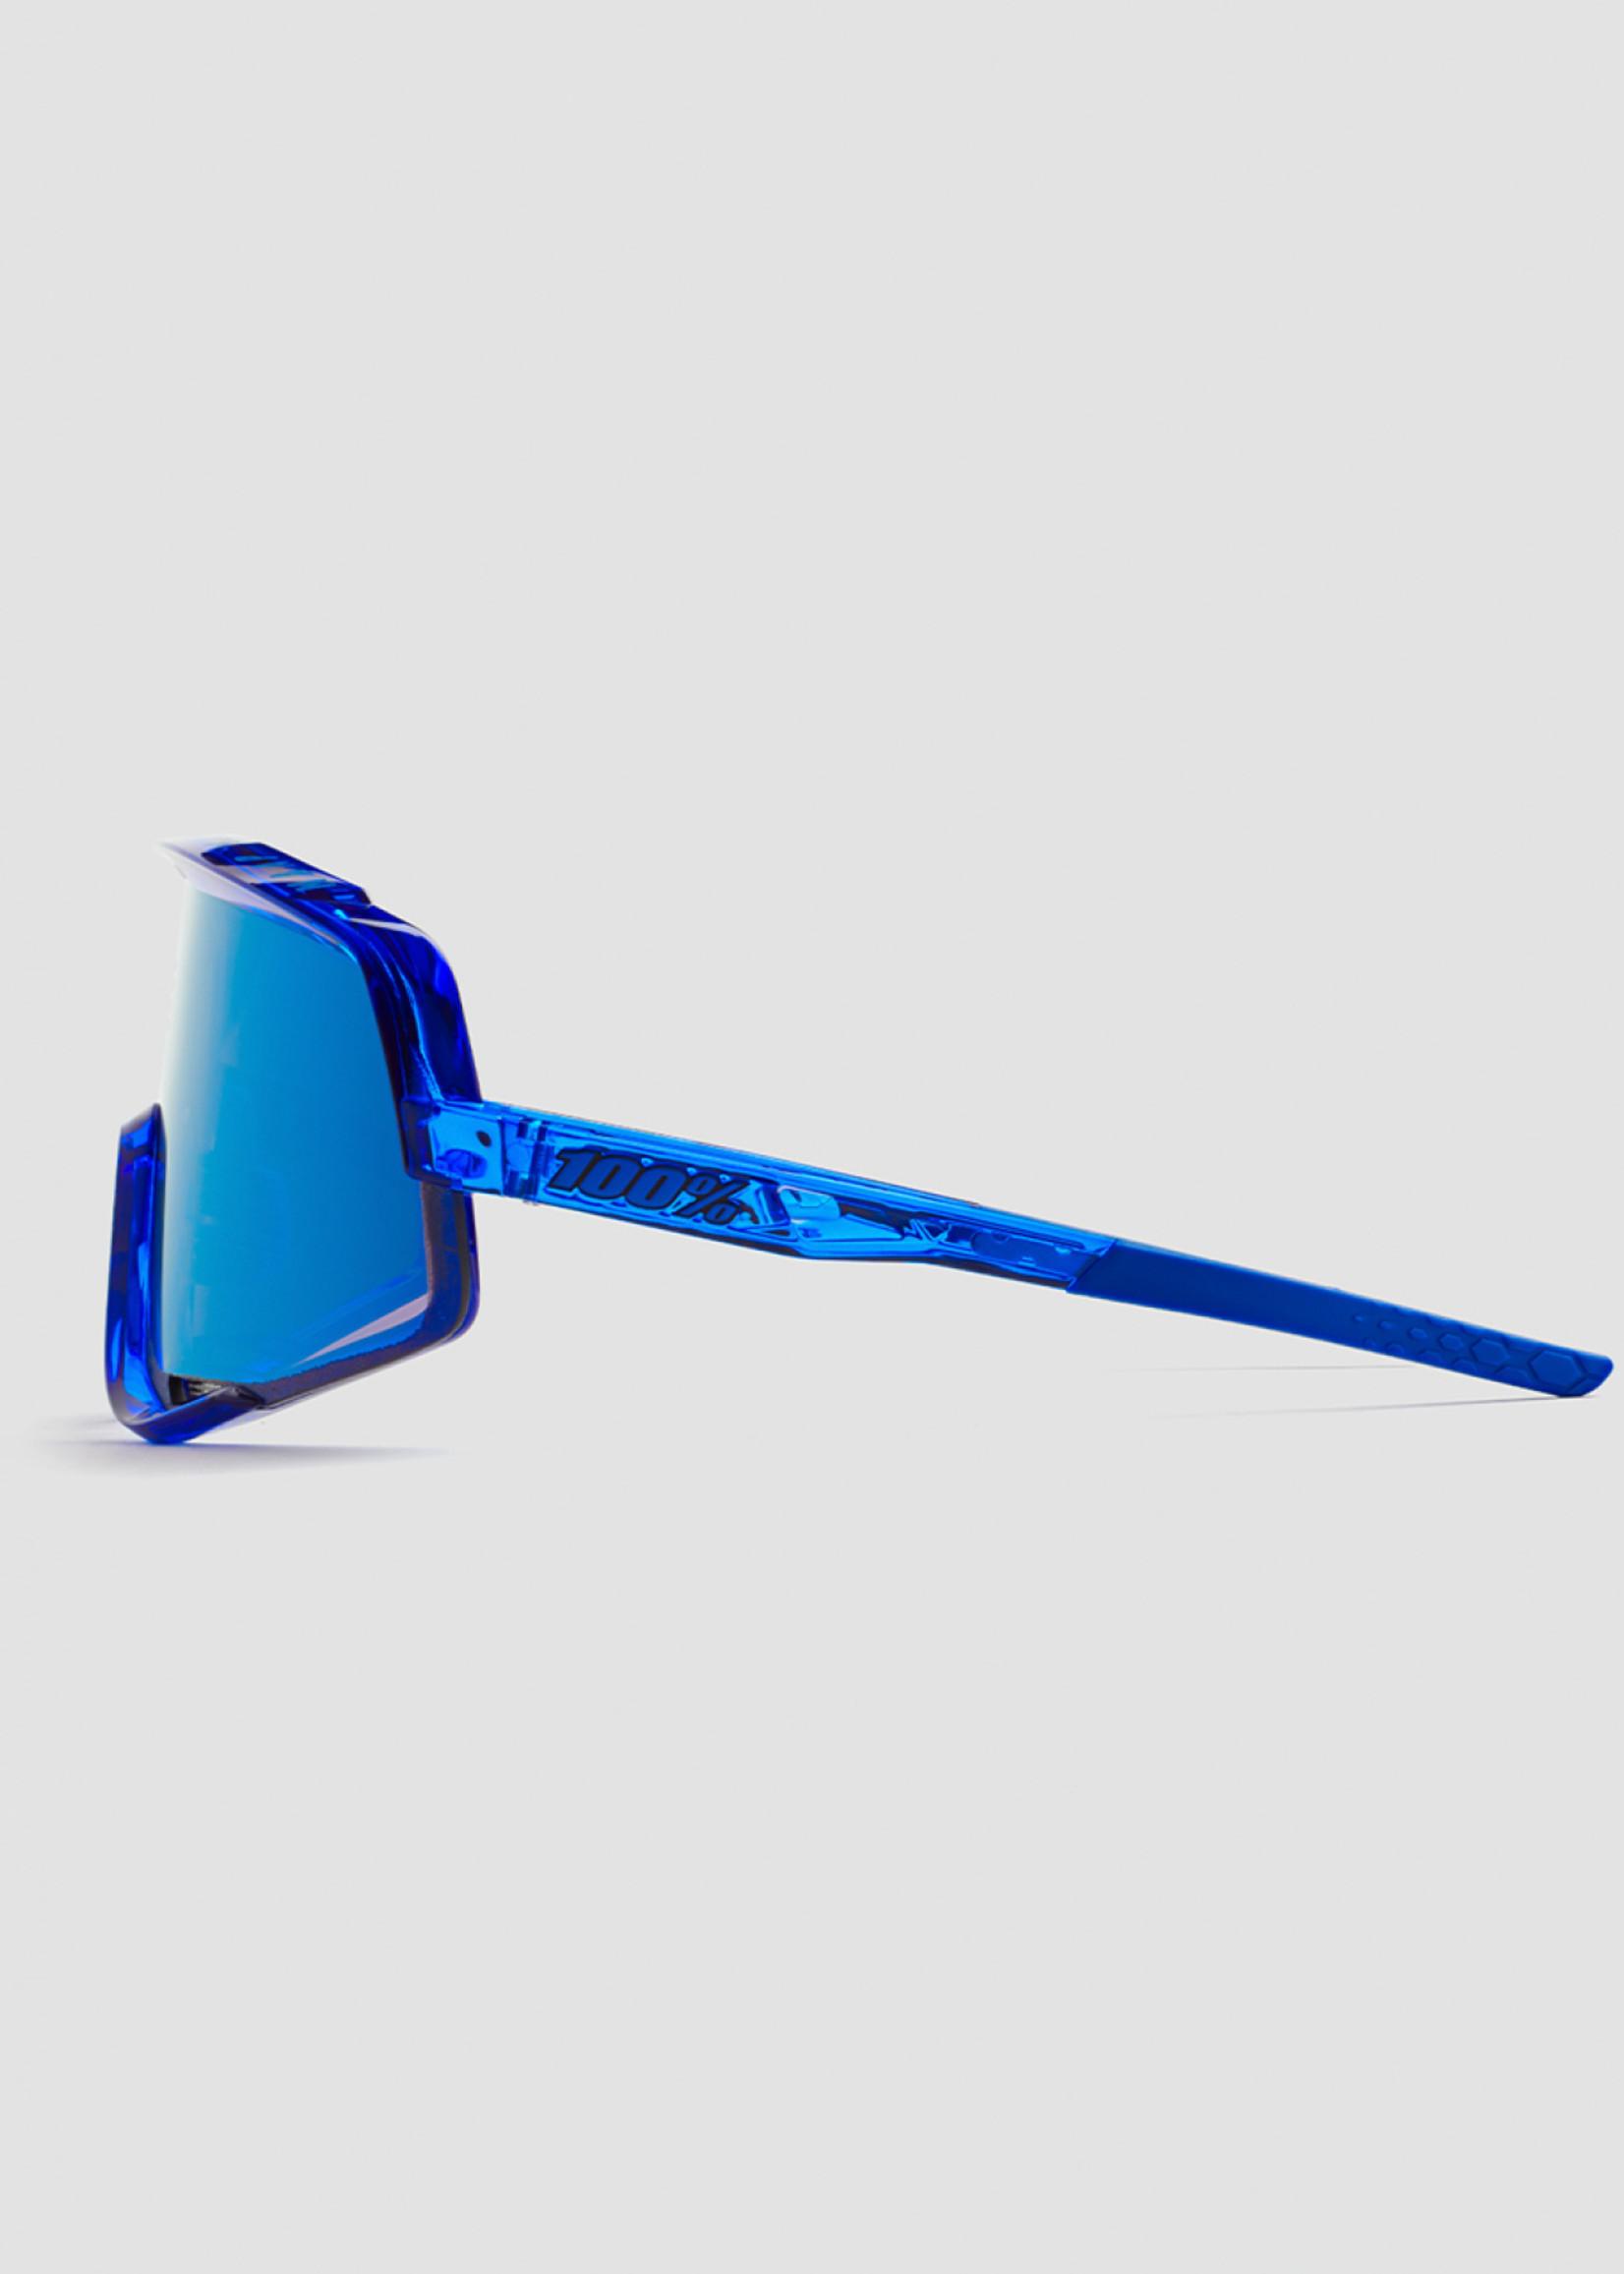 100% Glendale x Maap - Blauw